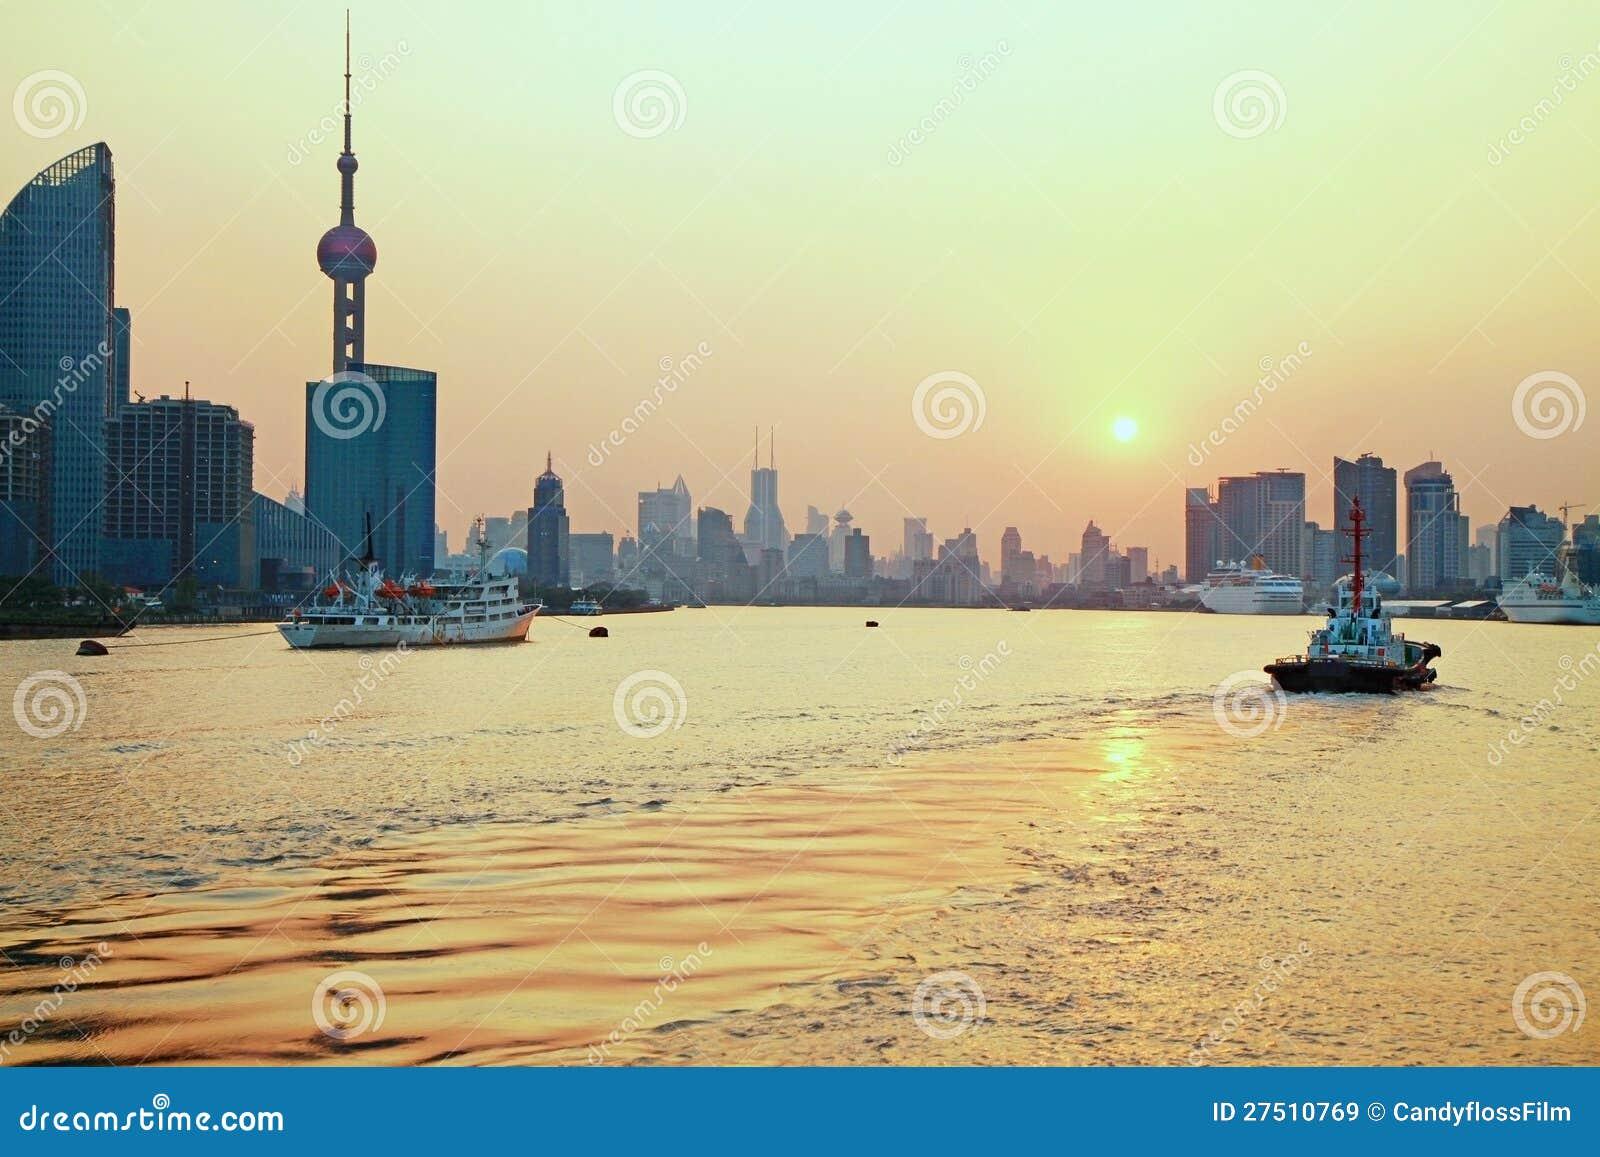 golden shanghai stock image image of neon river sunset 27510769